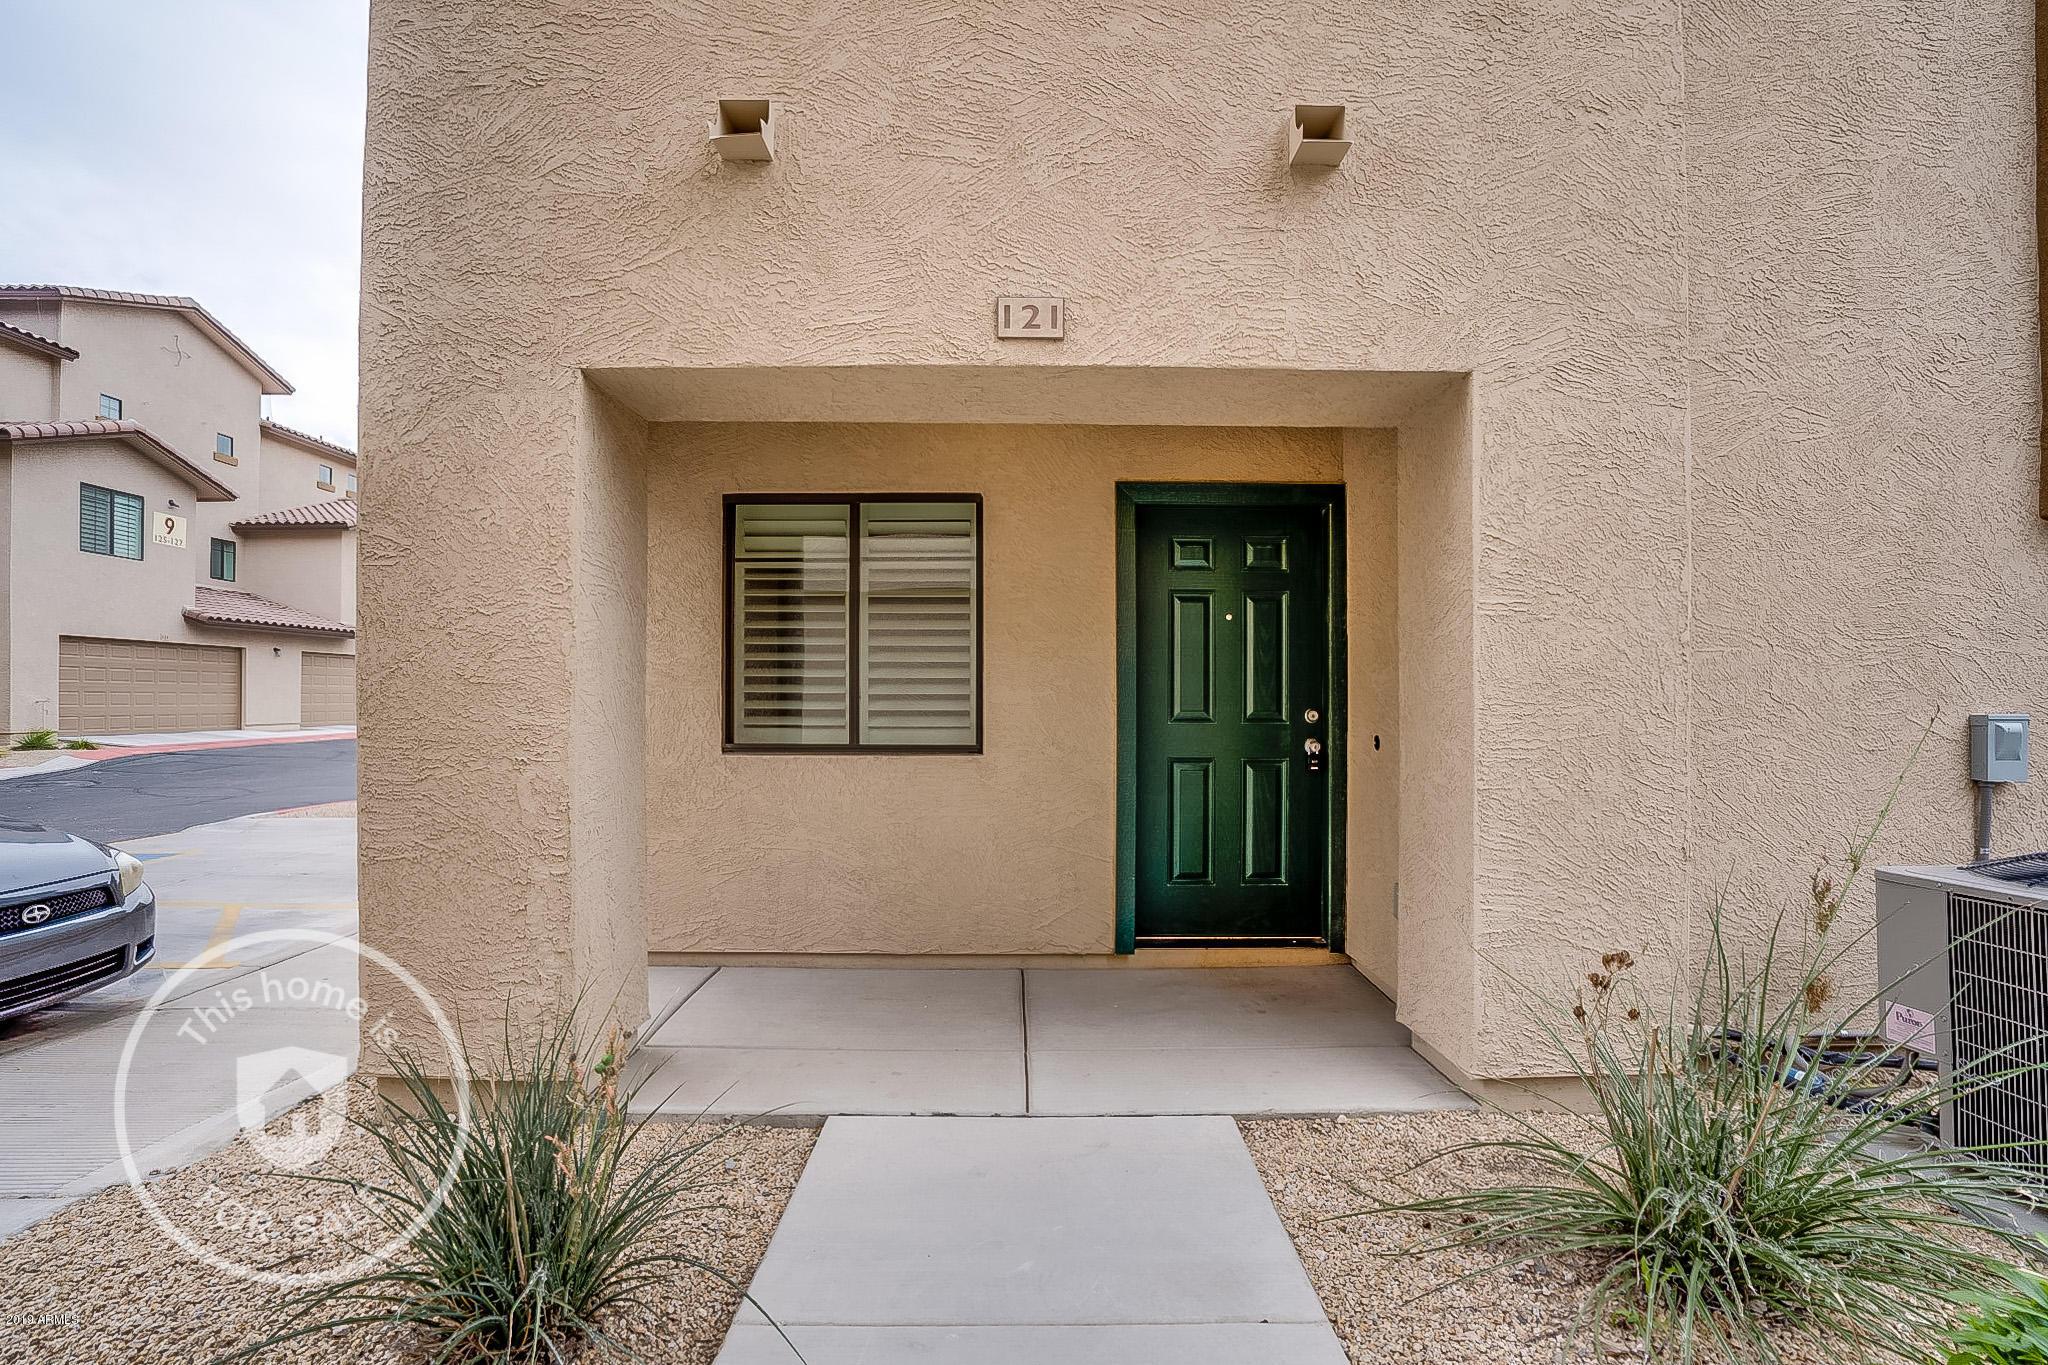 Photo of 2315 N 52ND Street #121, Phoenix, AZ 85008